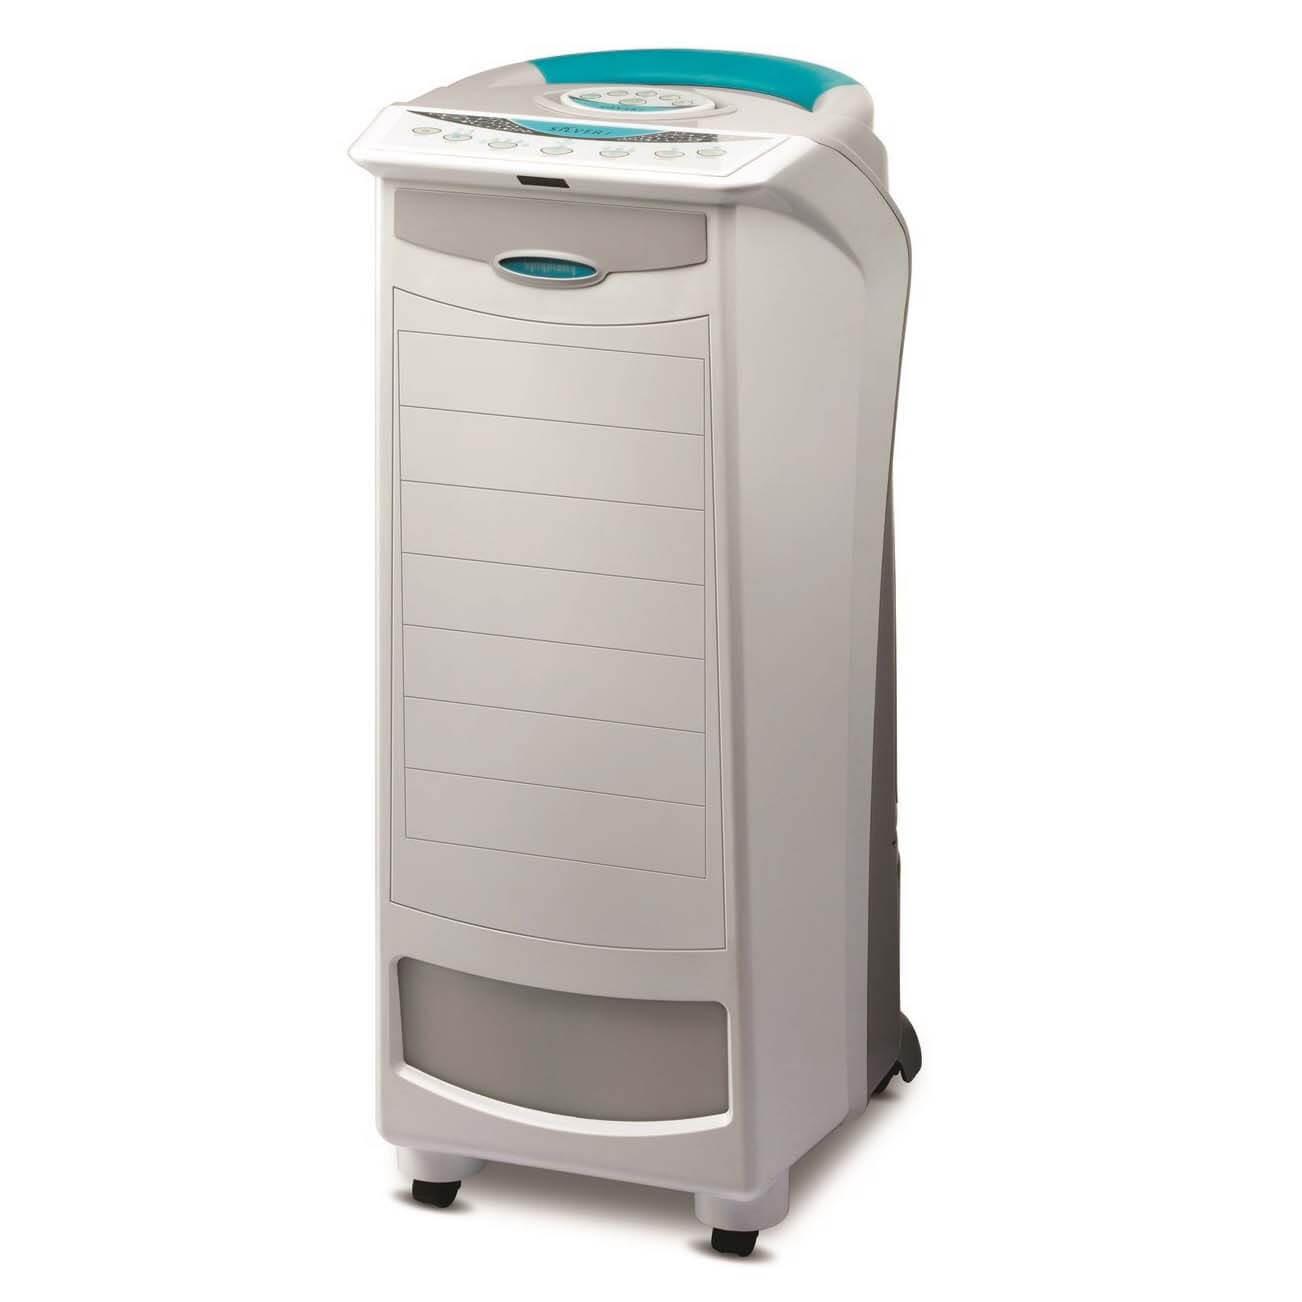 Symphony White Silver-I 9L Evaporative Air Cooler